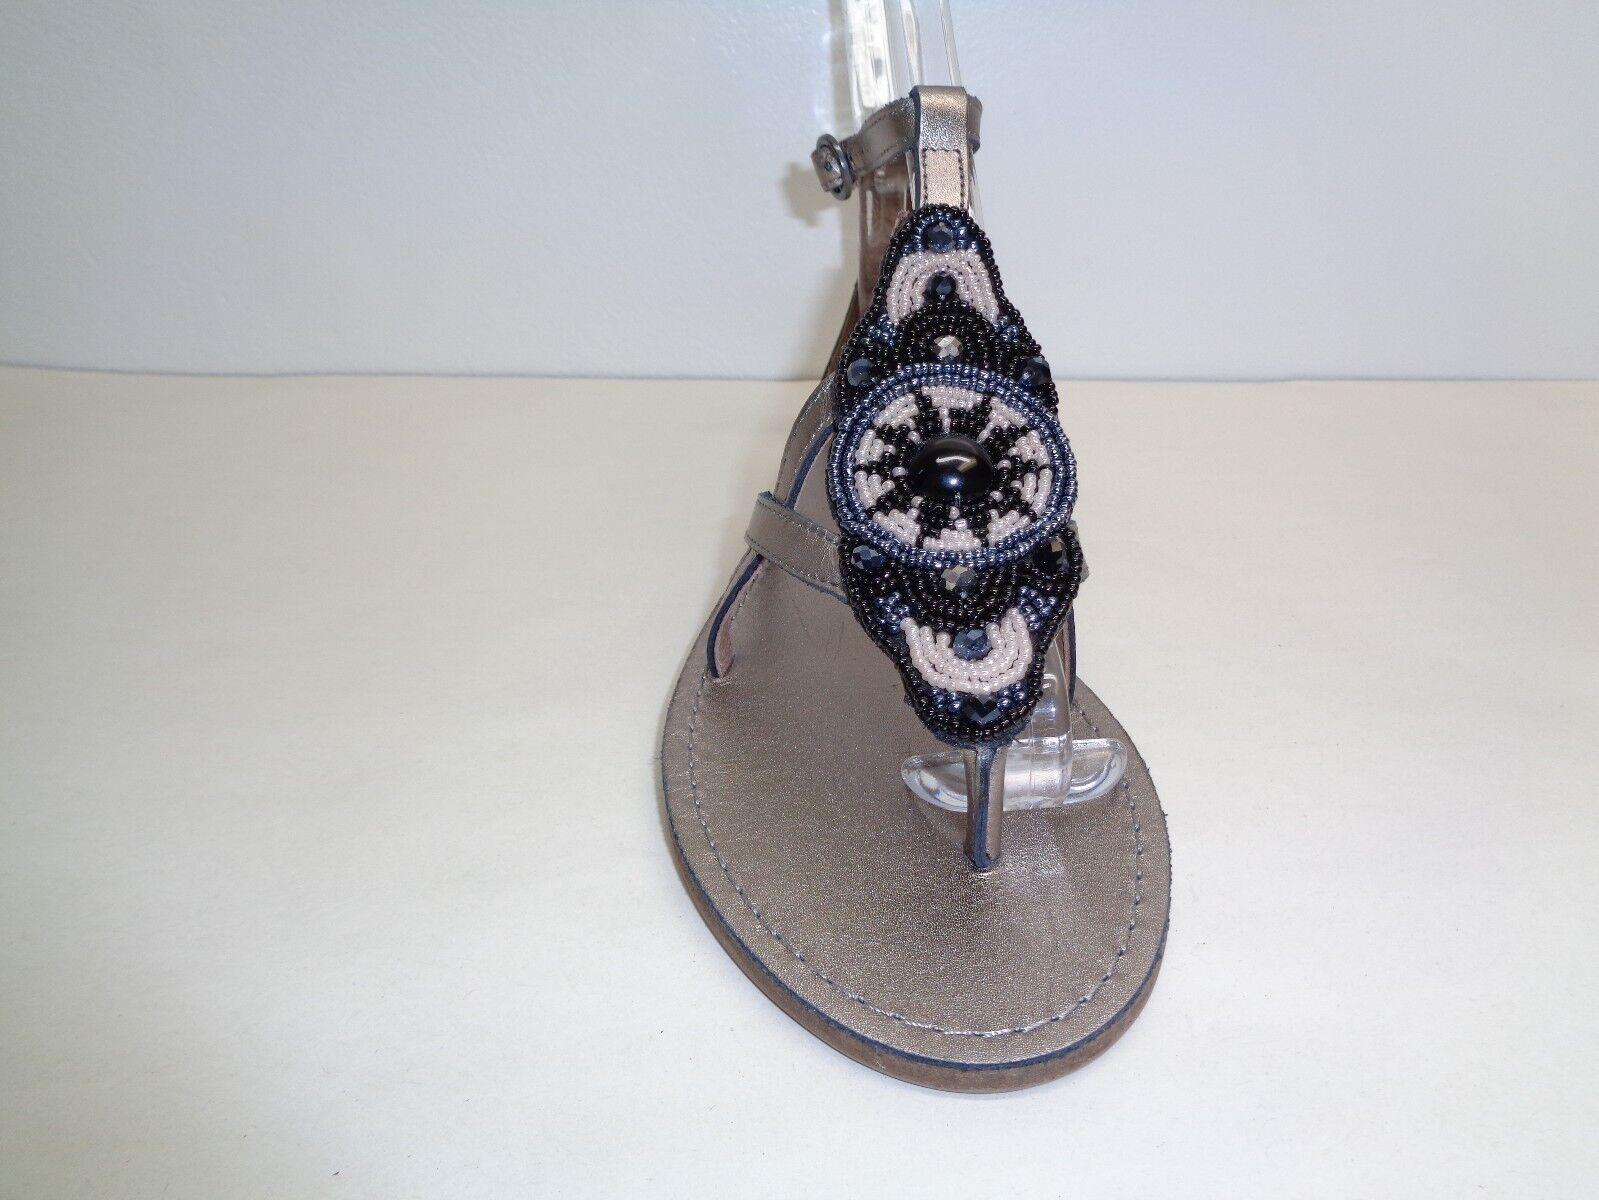 Tommy Tommy Tommy Bahama Größe 8 PRIMROSE Pewter Gray Leder Beads Sandales New Damenschuhe Schuhes c355ff